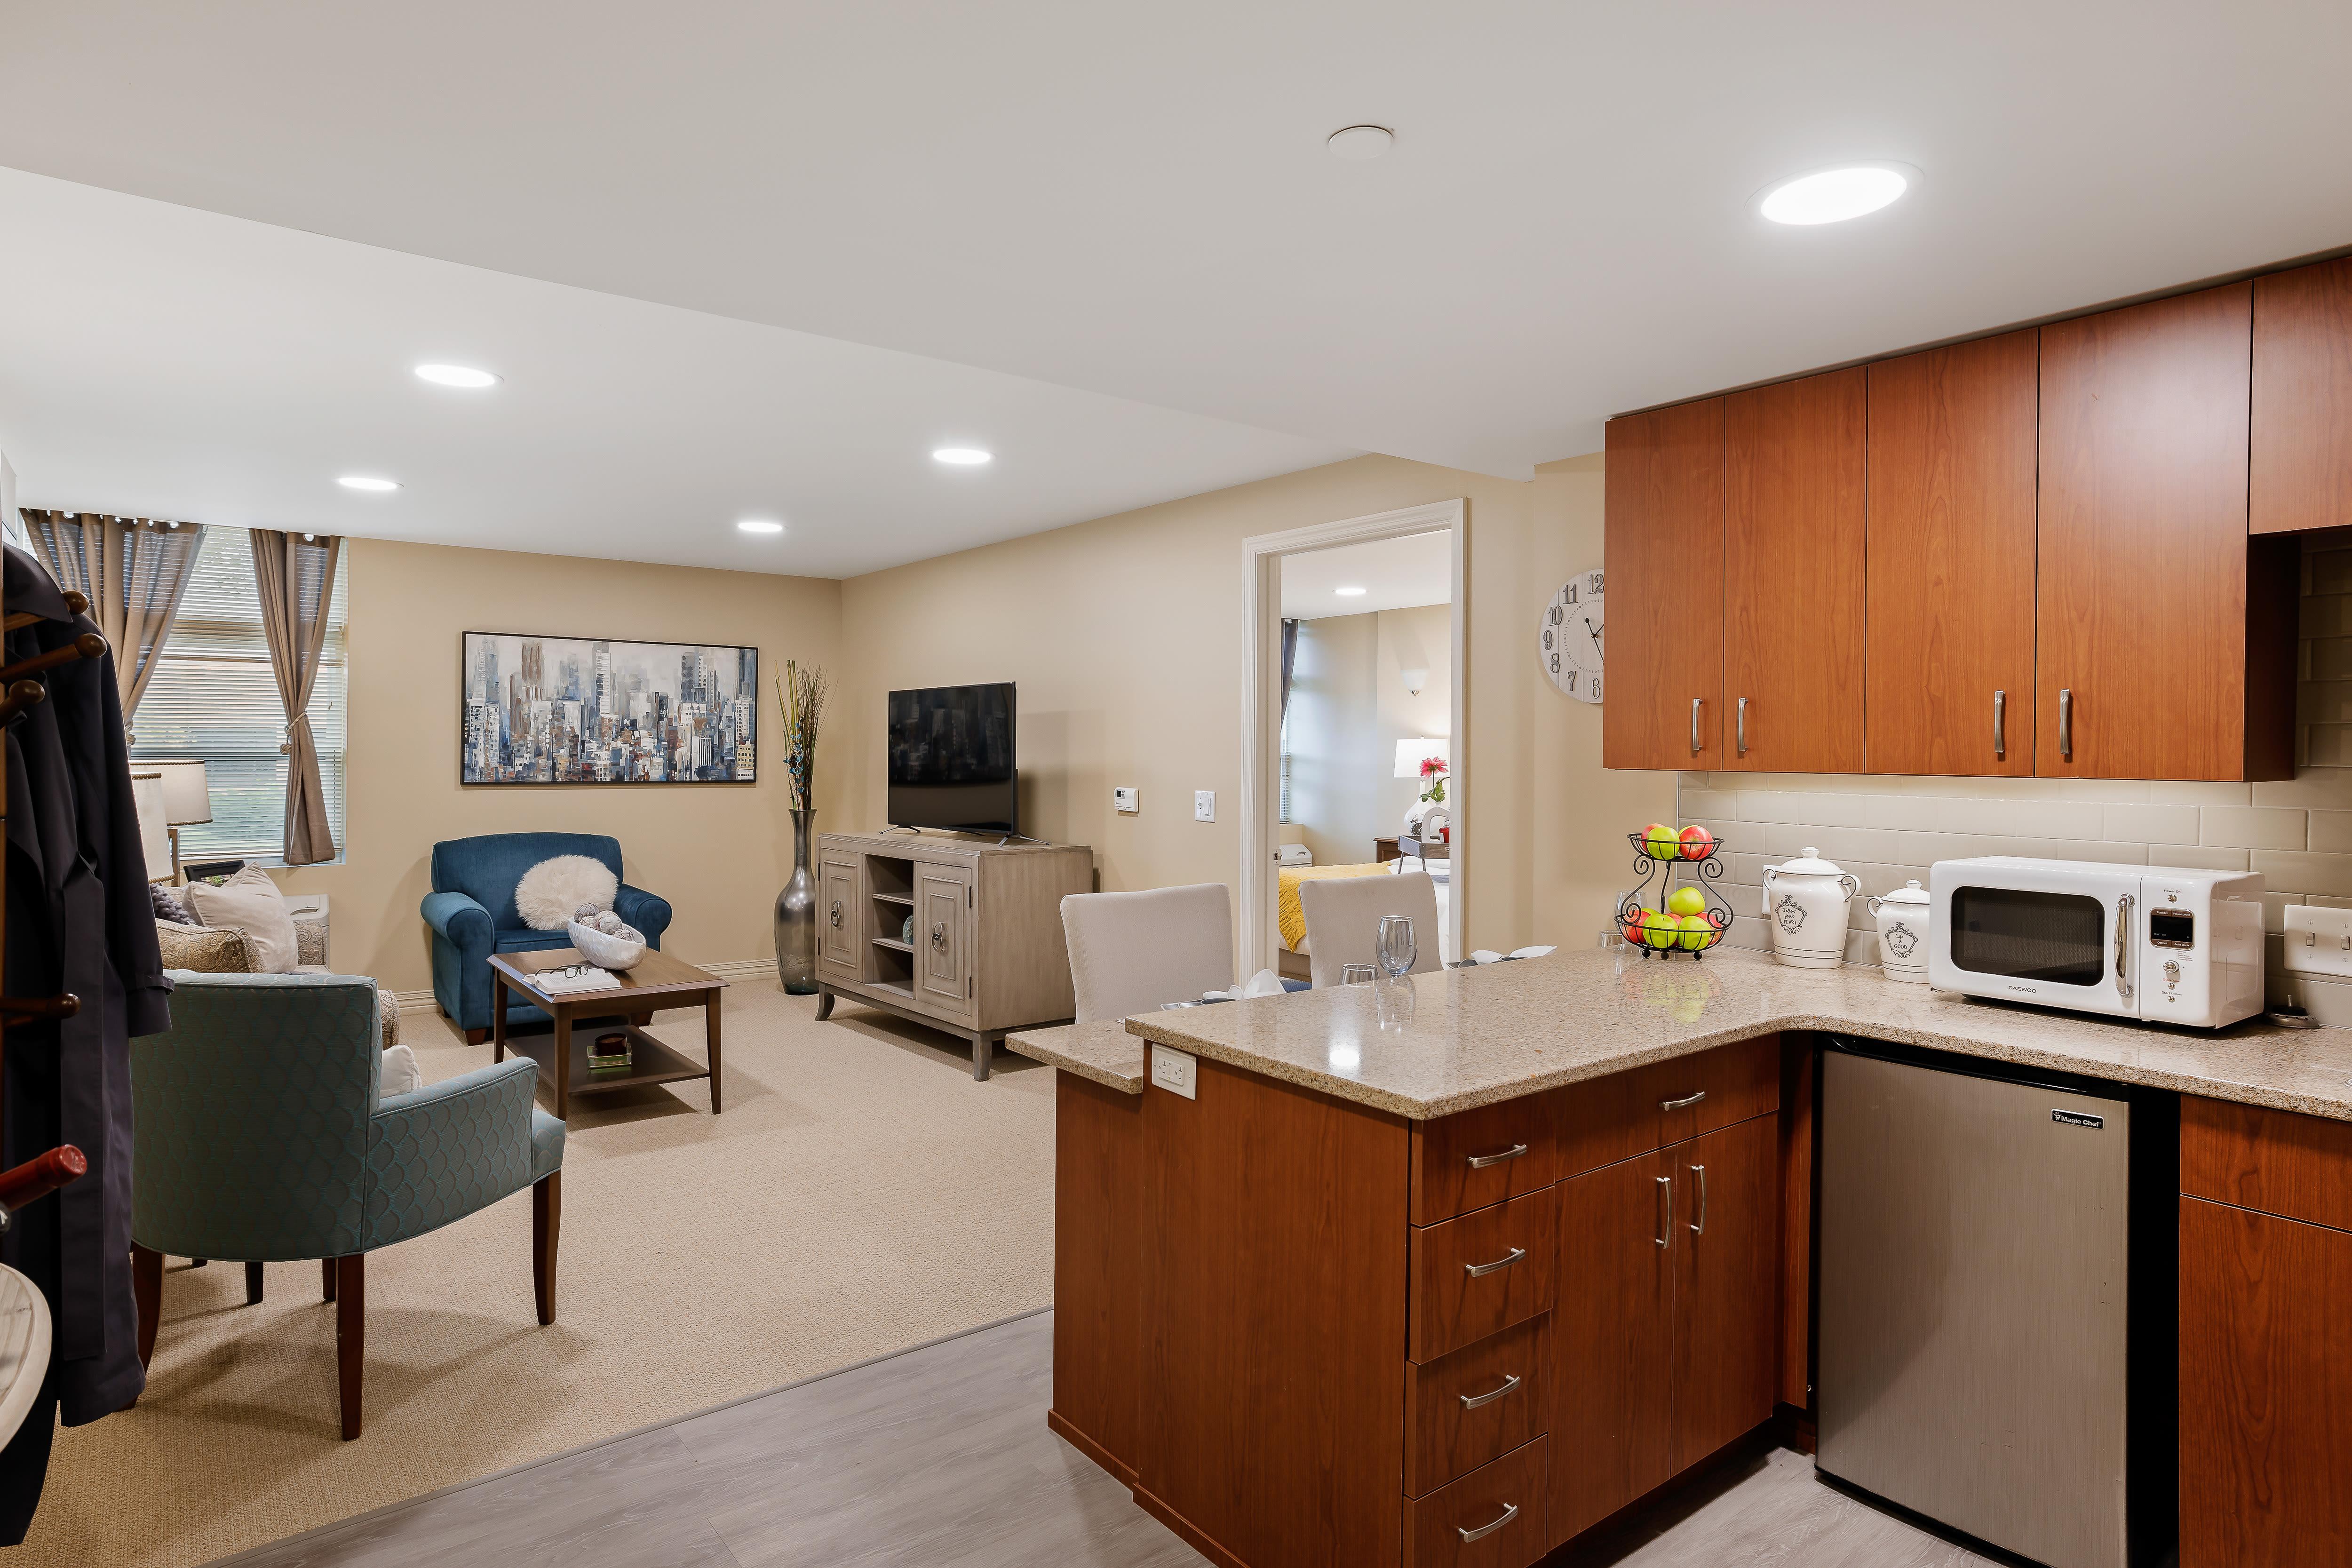 Apartment at Anthology of Olathe in Olathe, Kansas